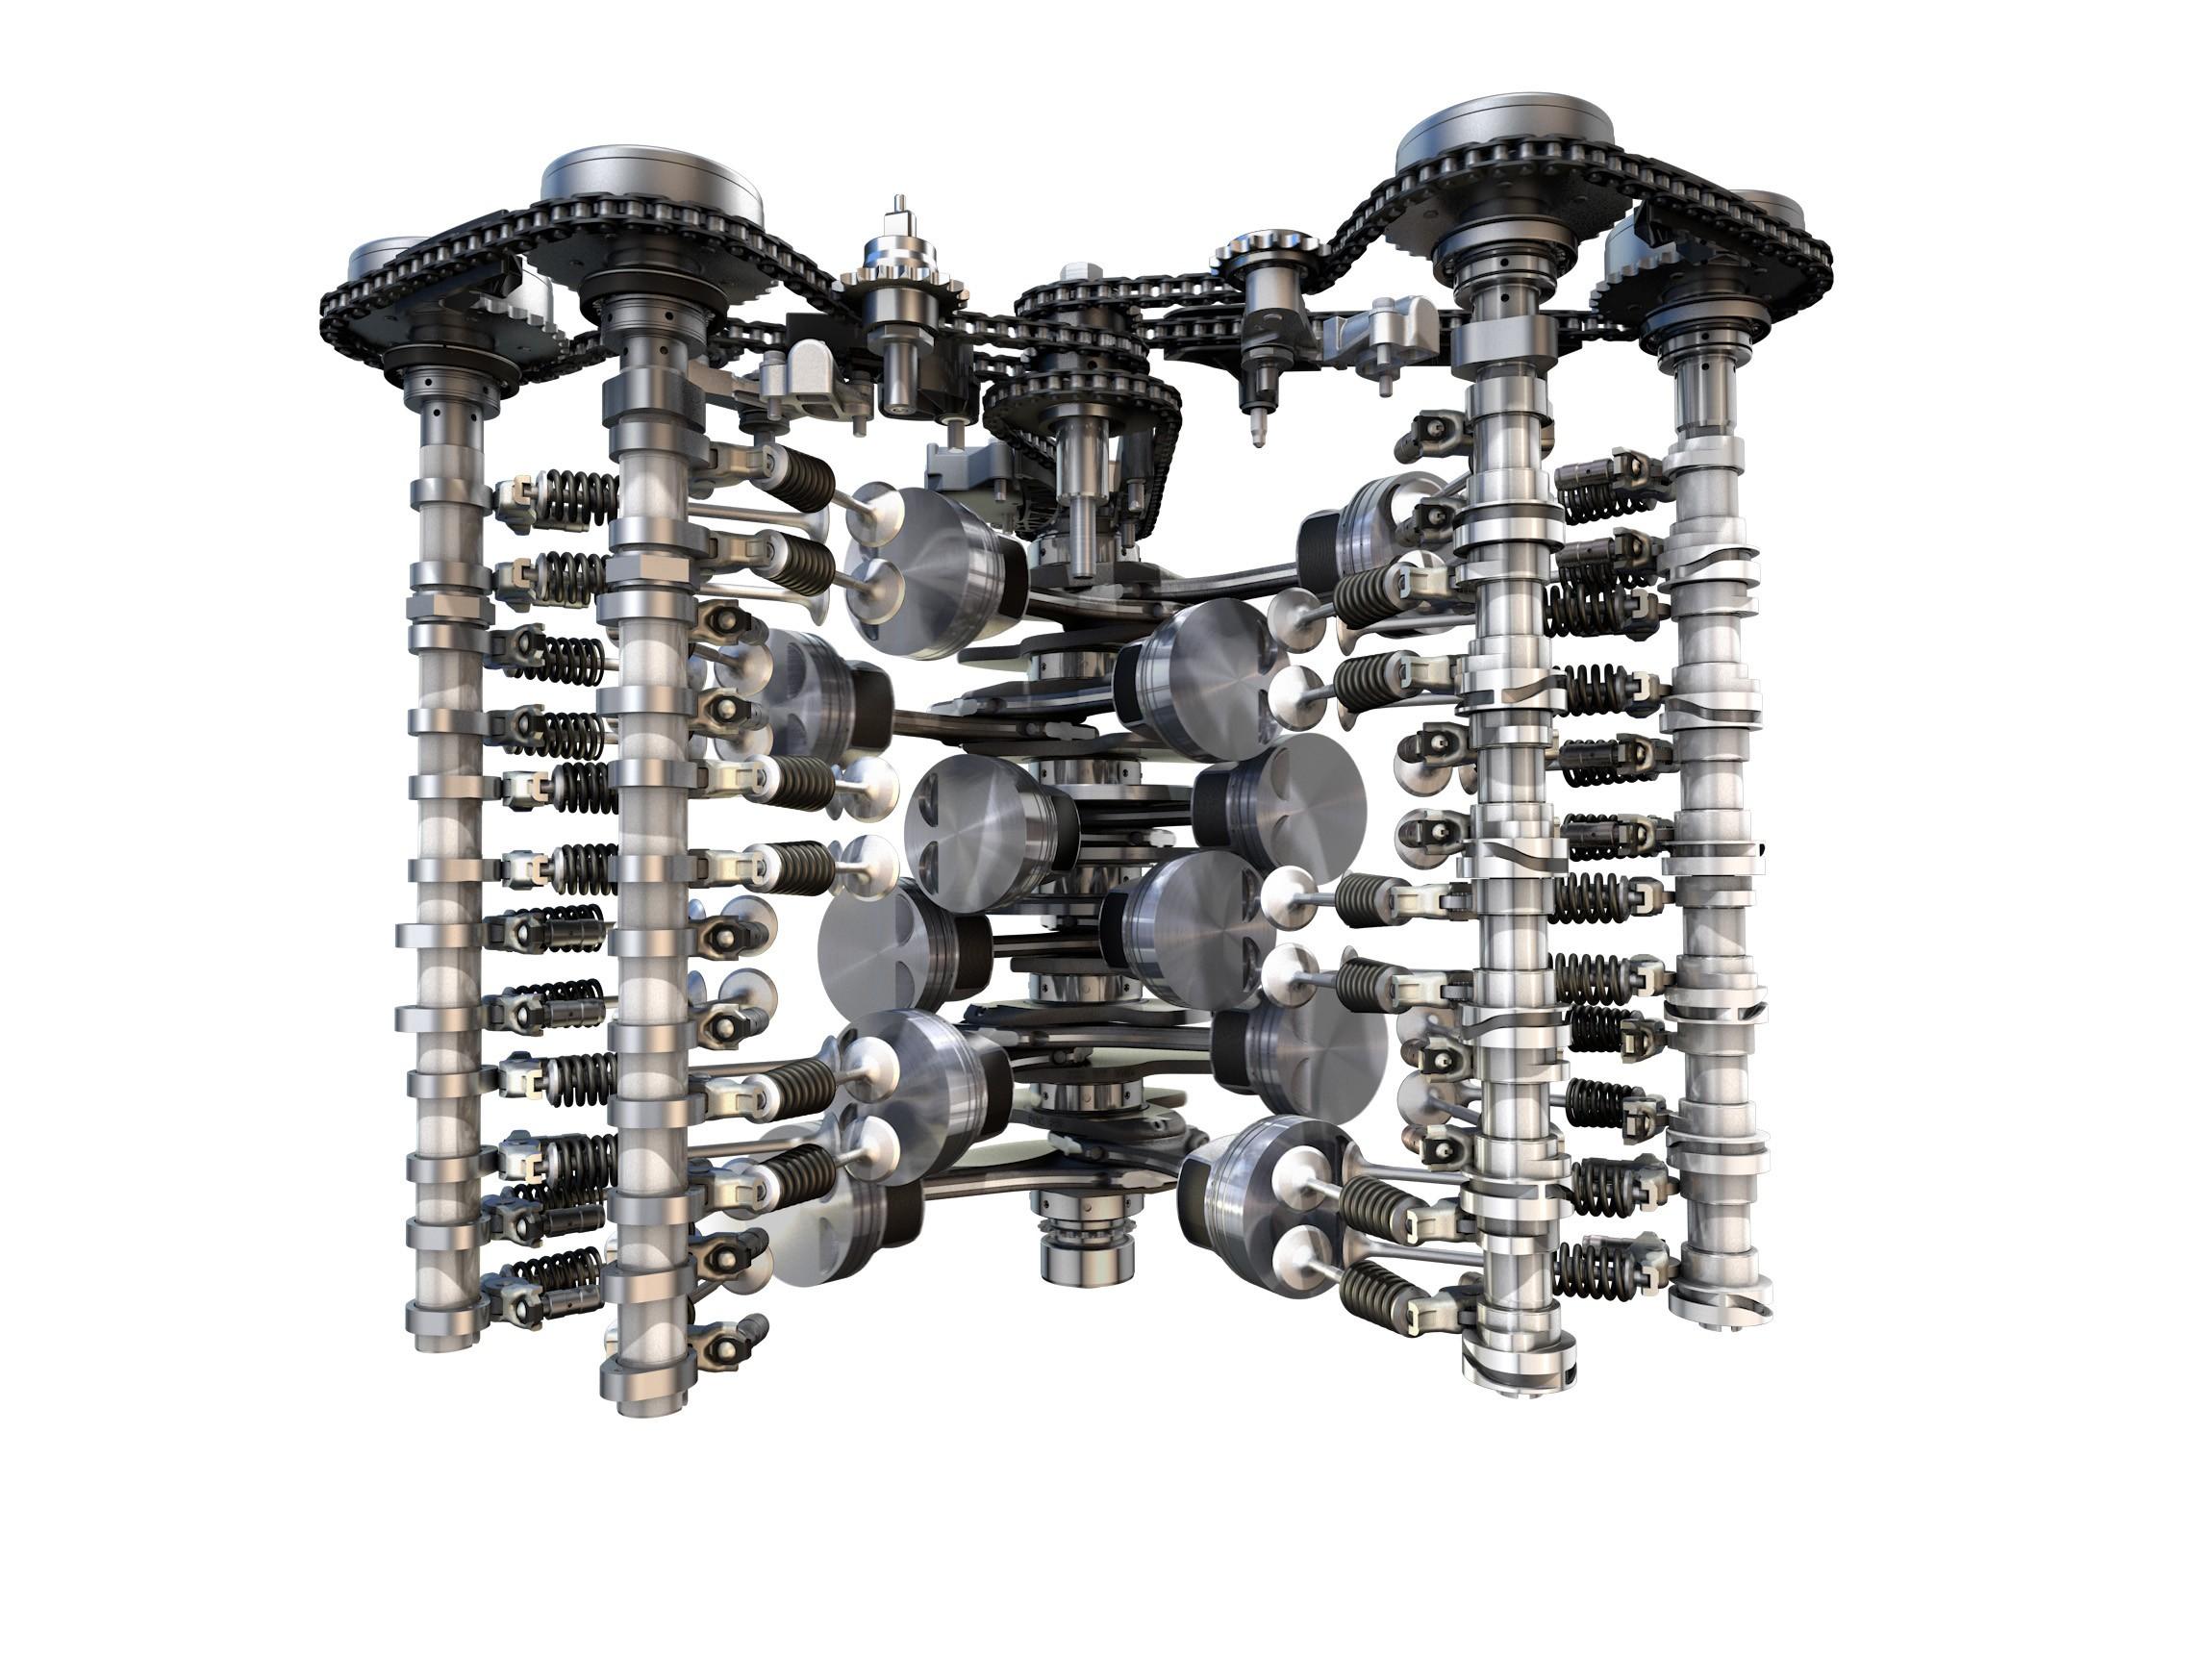 Volkswagen Unveils New 6 Liter W12 Tsi Twin Turbo Engine